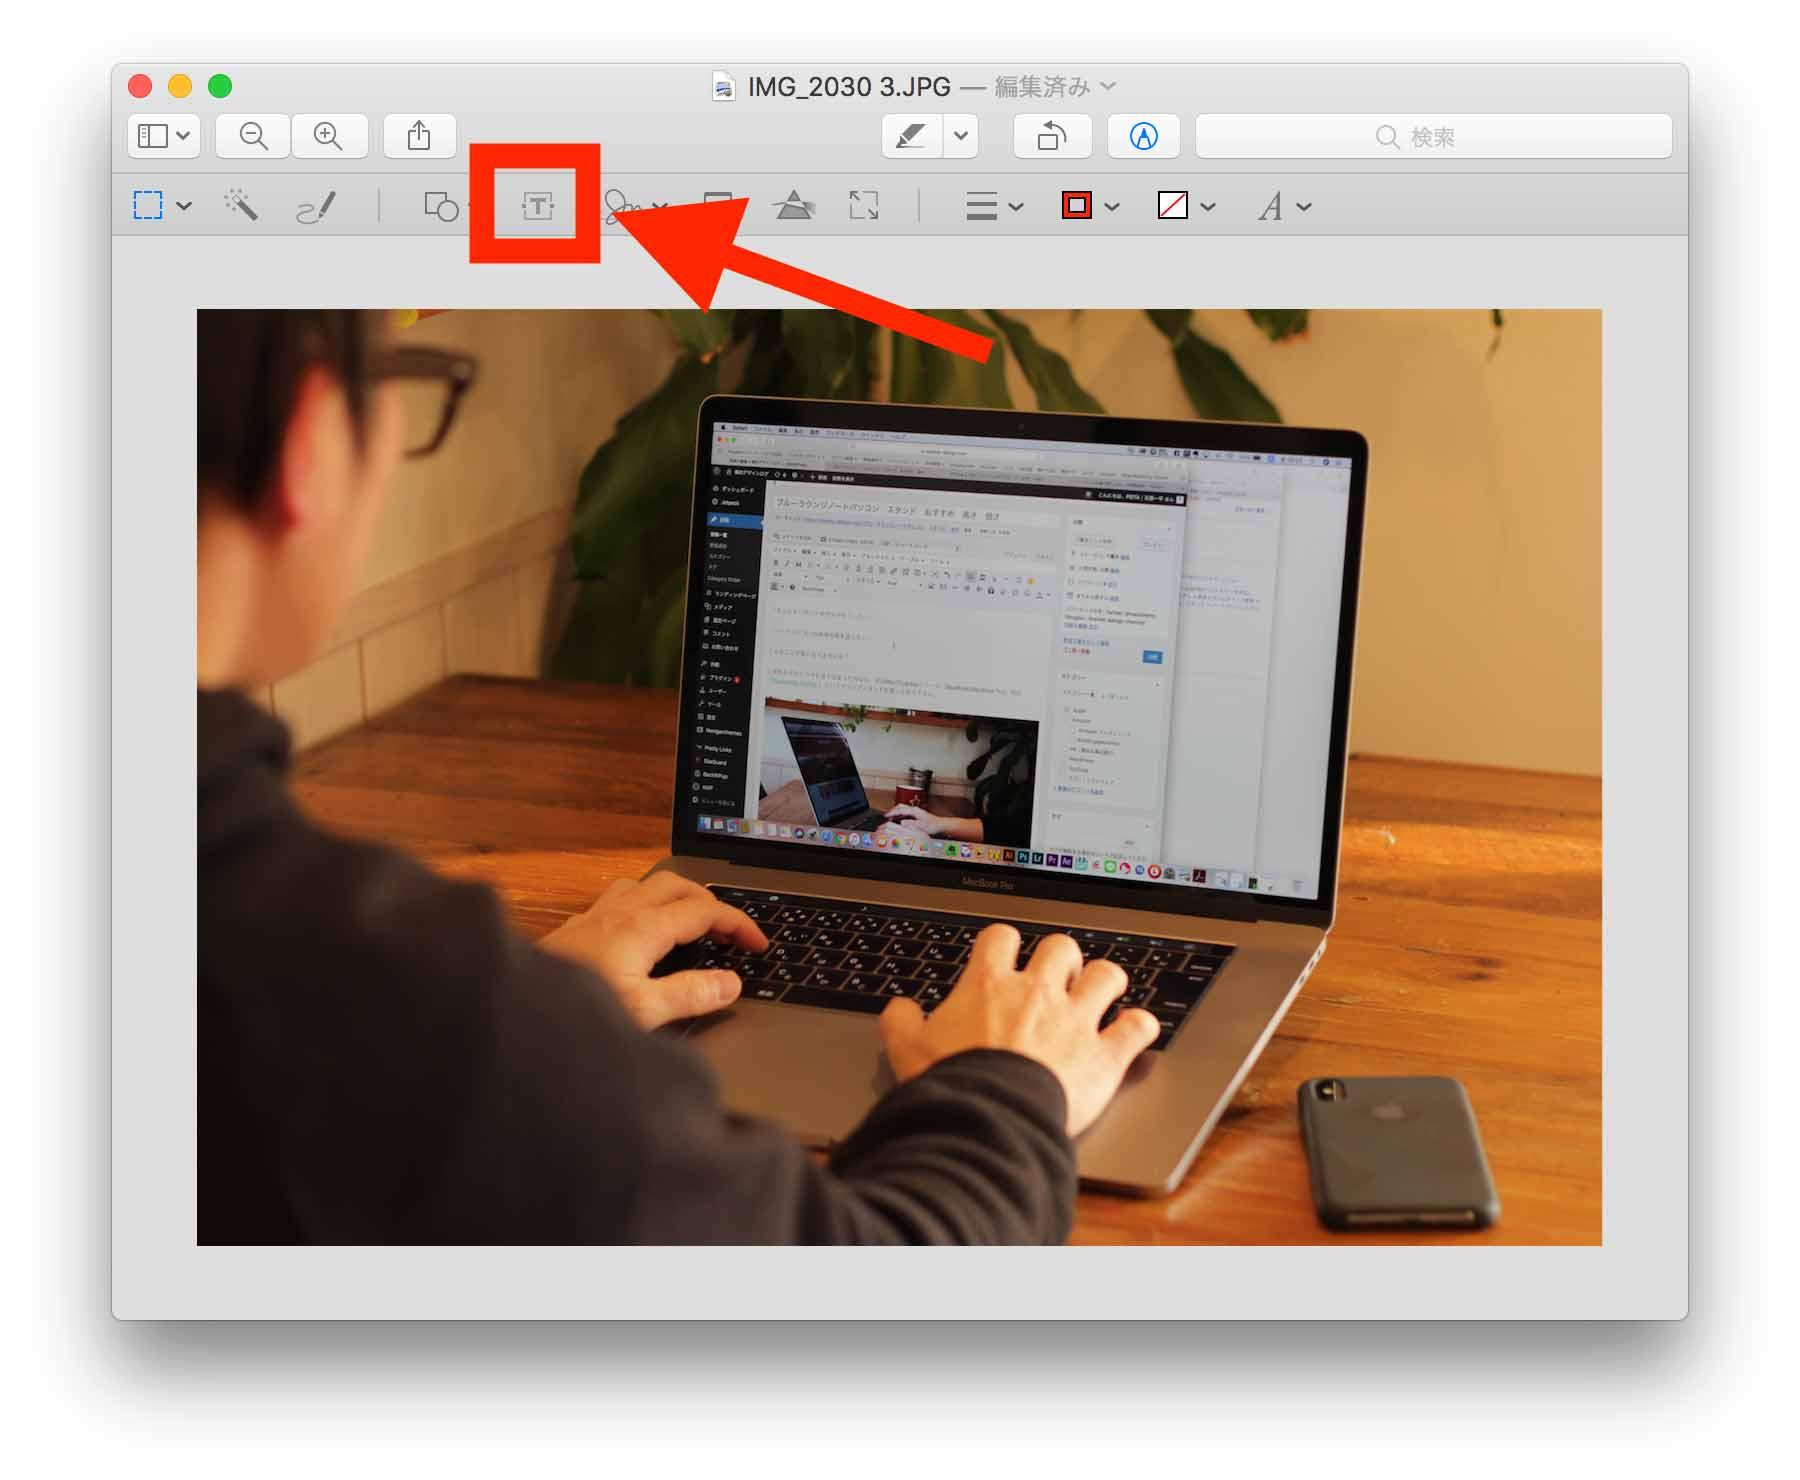 Macプレビュー編集画面でテキストアイコンを選択している画像